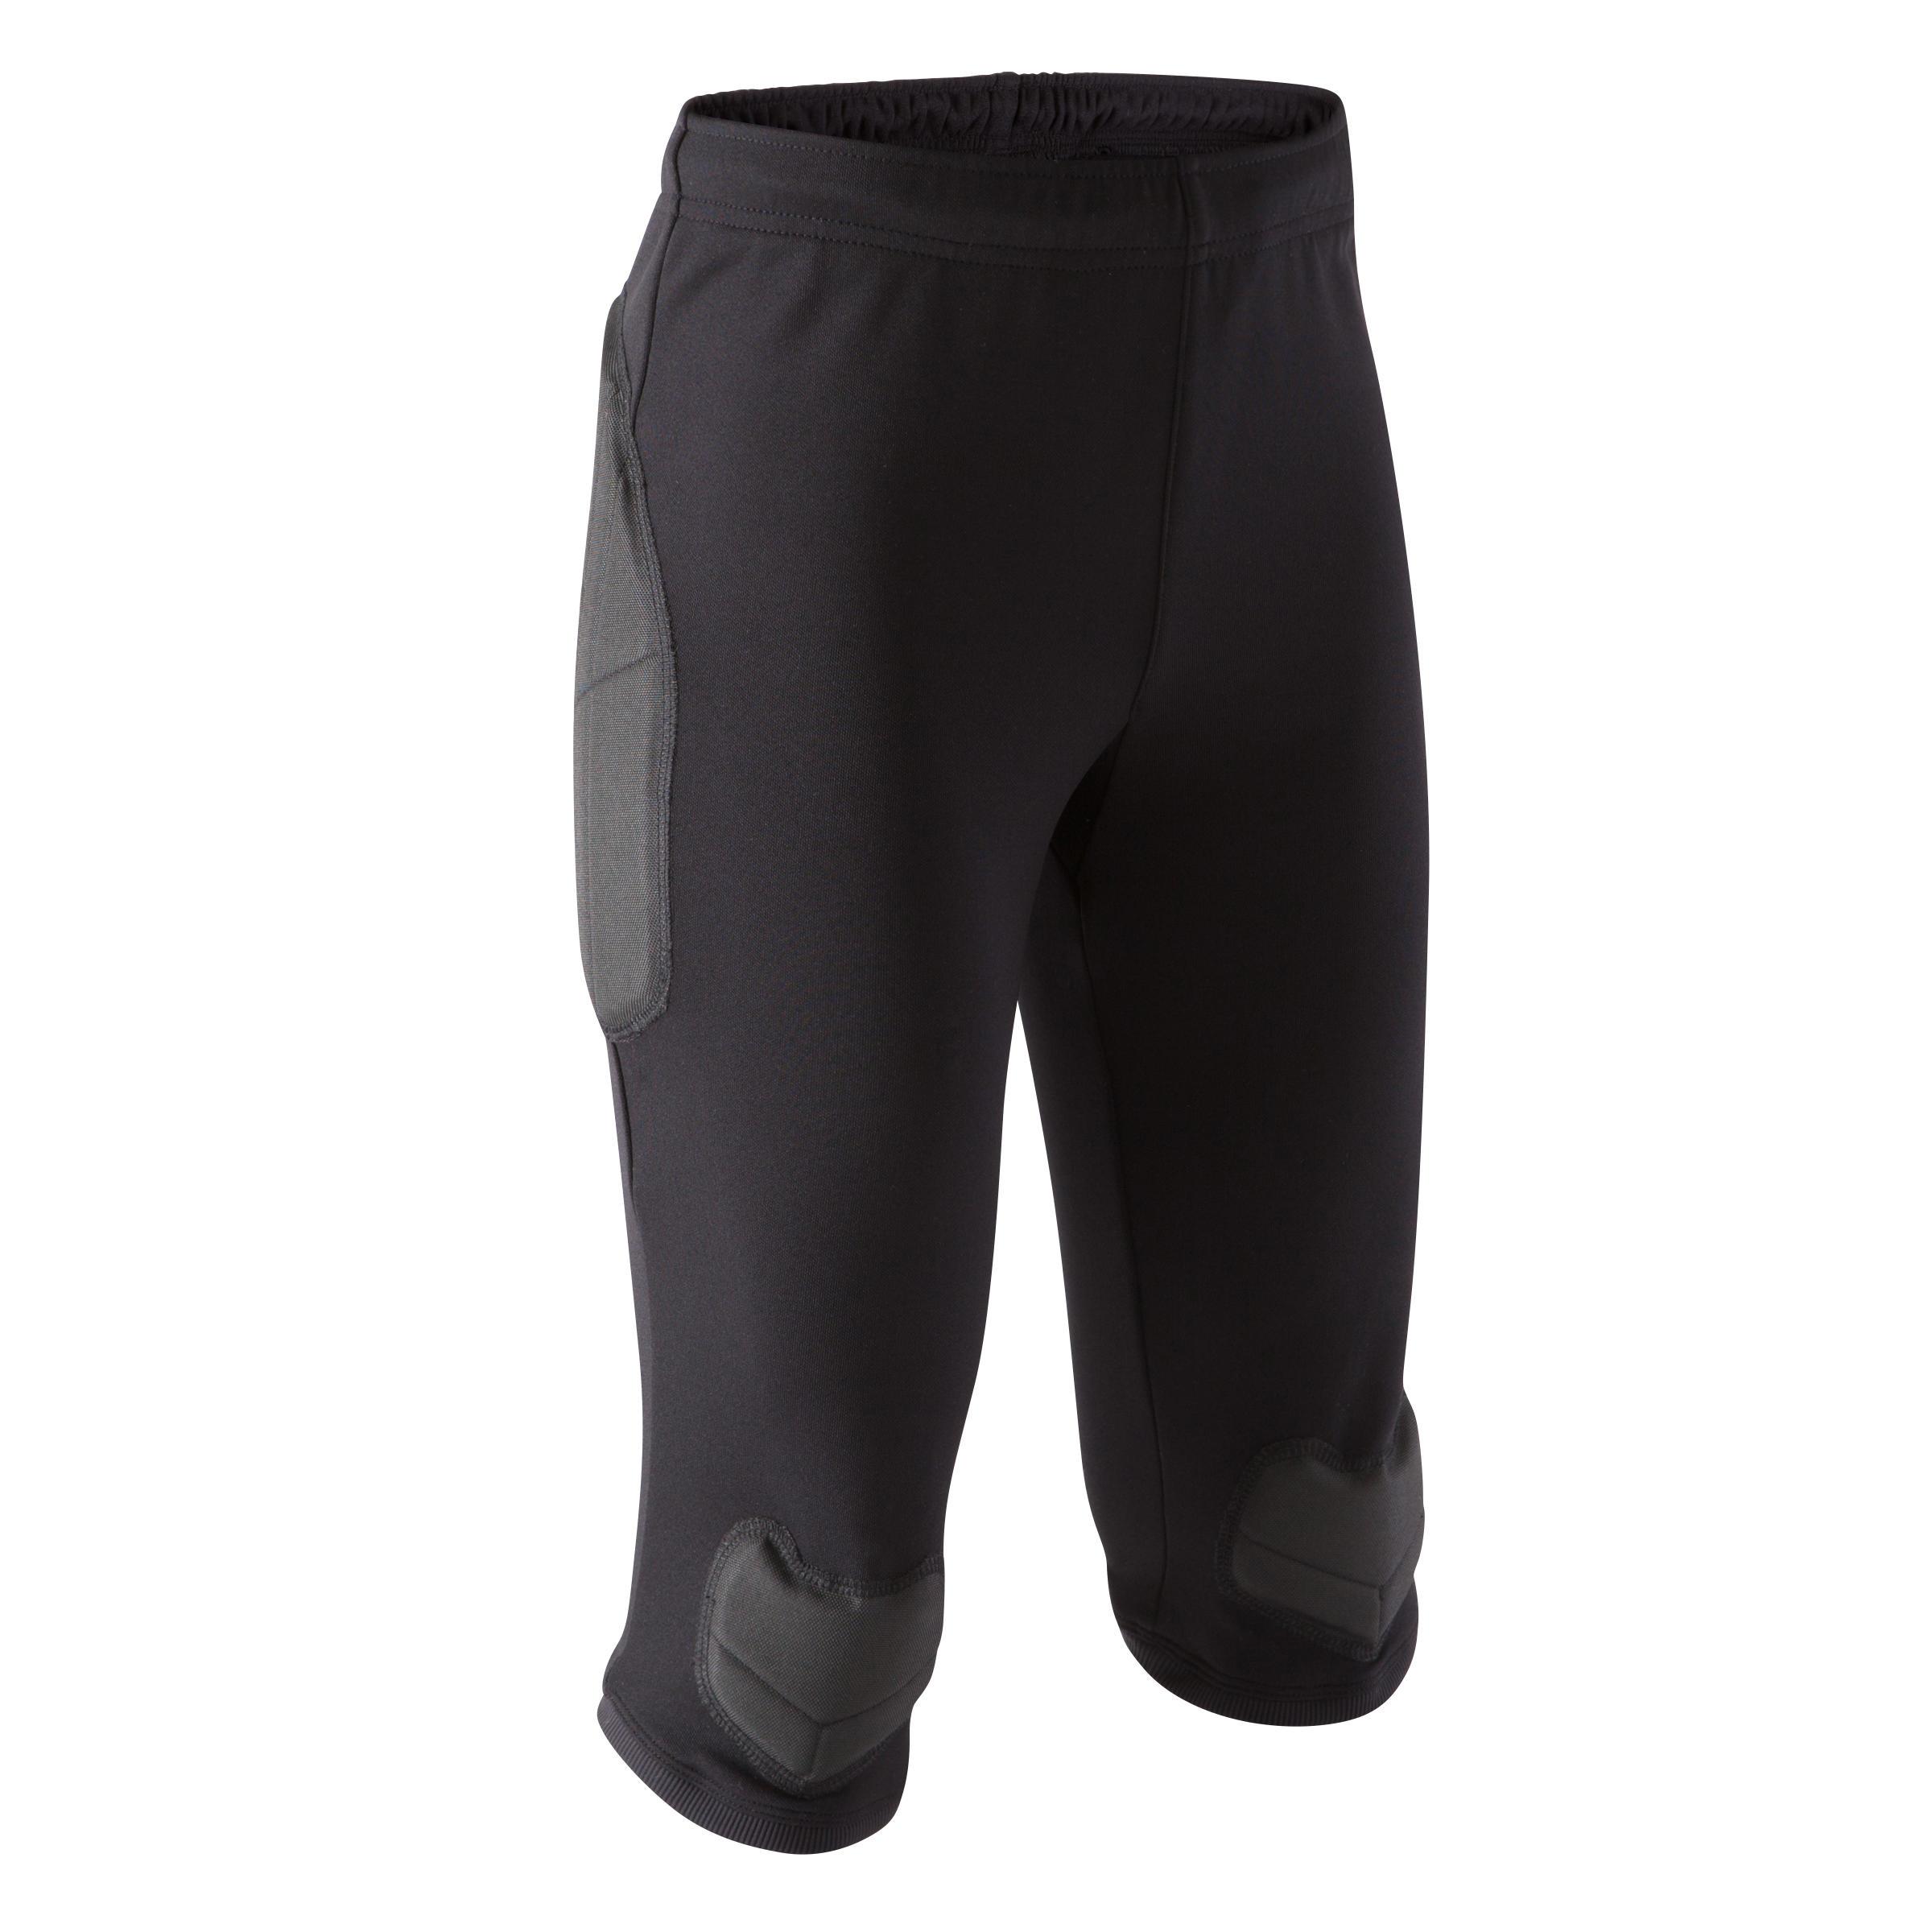 Kipsta Keepersbroek kind F100 driekwart zwart